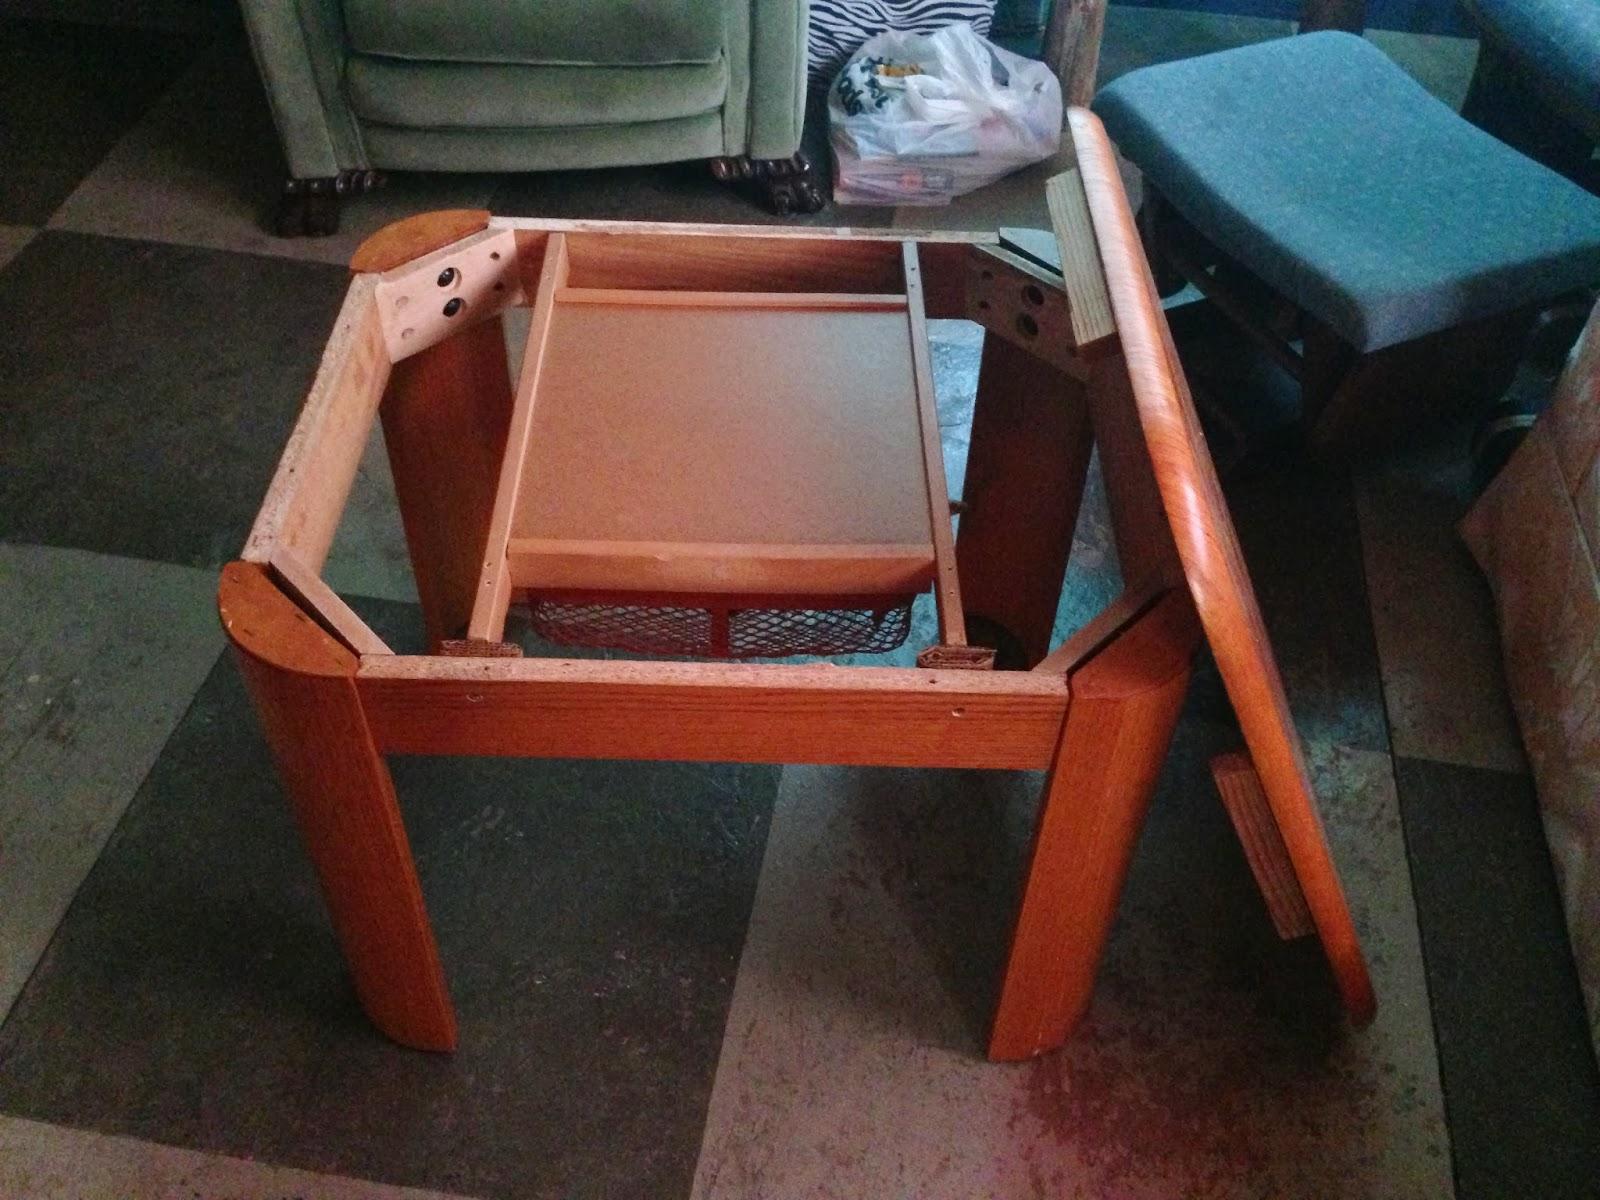 A Girl Named Edward How To Make A Kotatsu Table